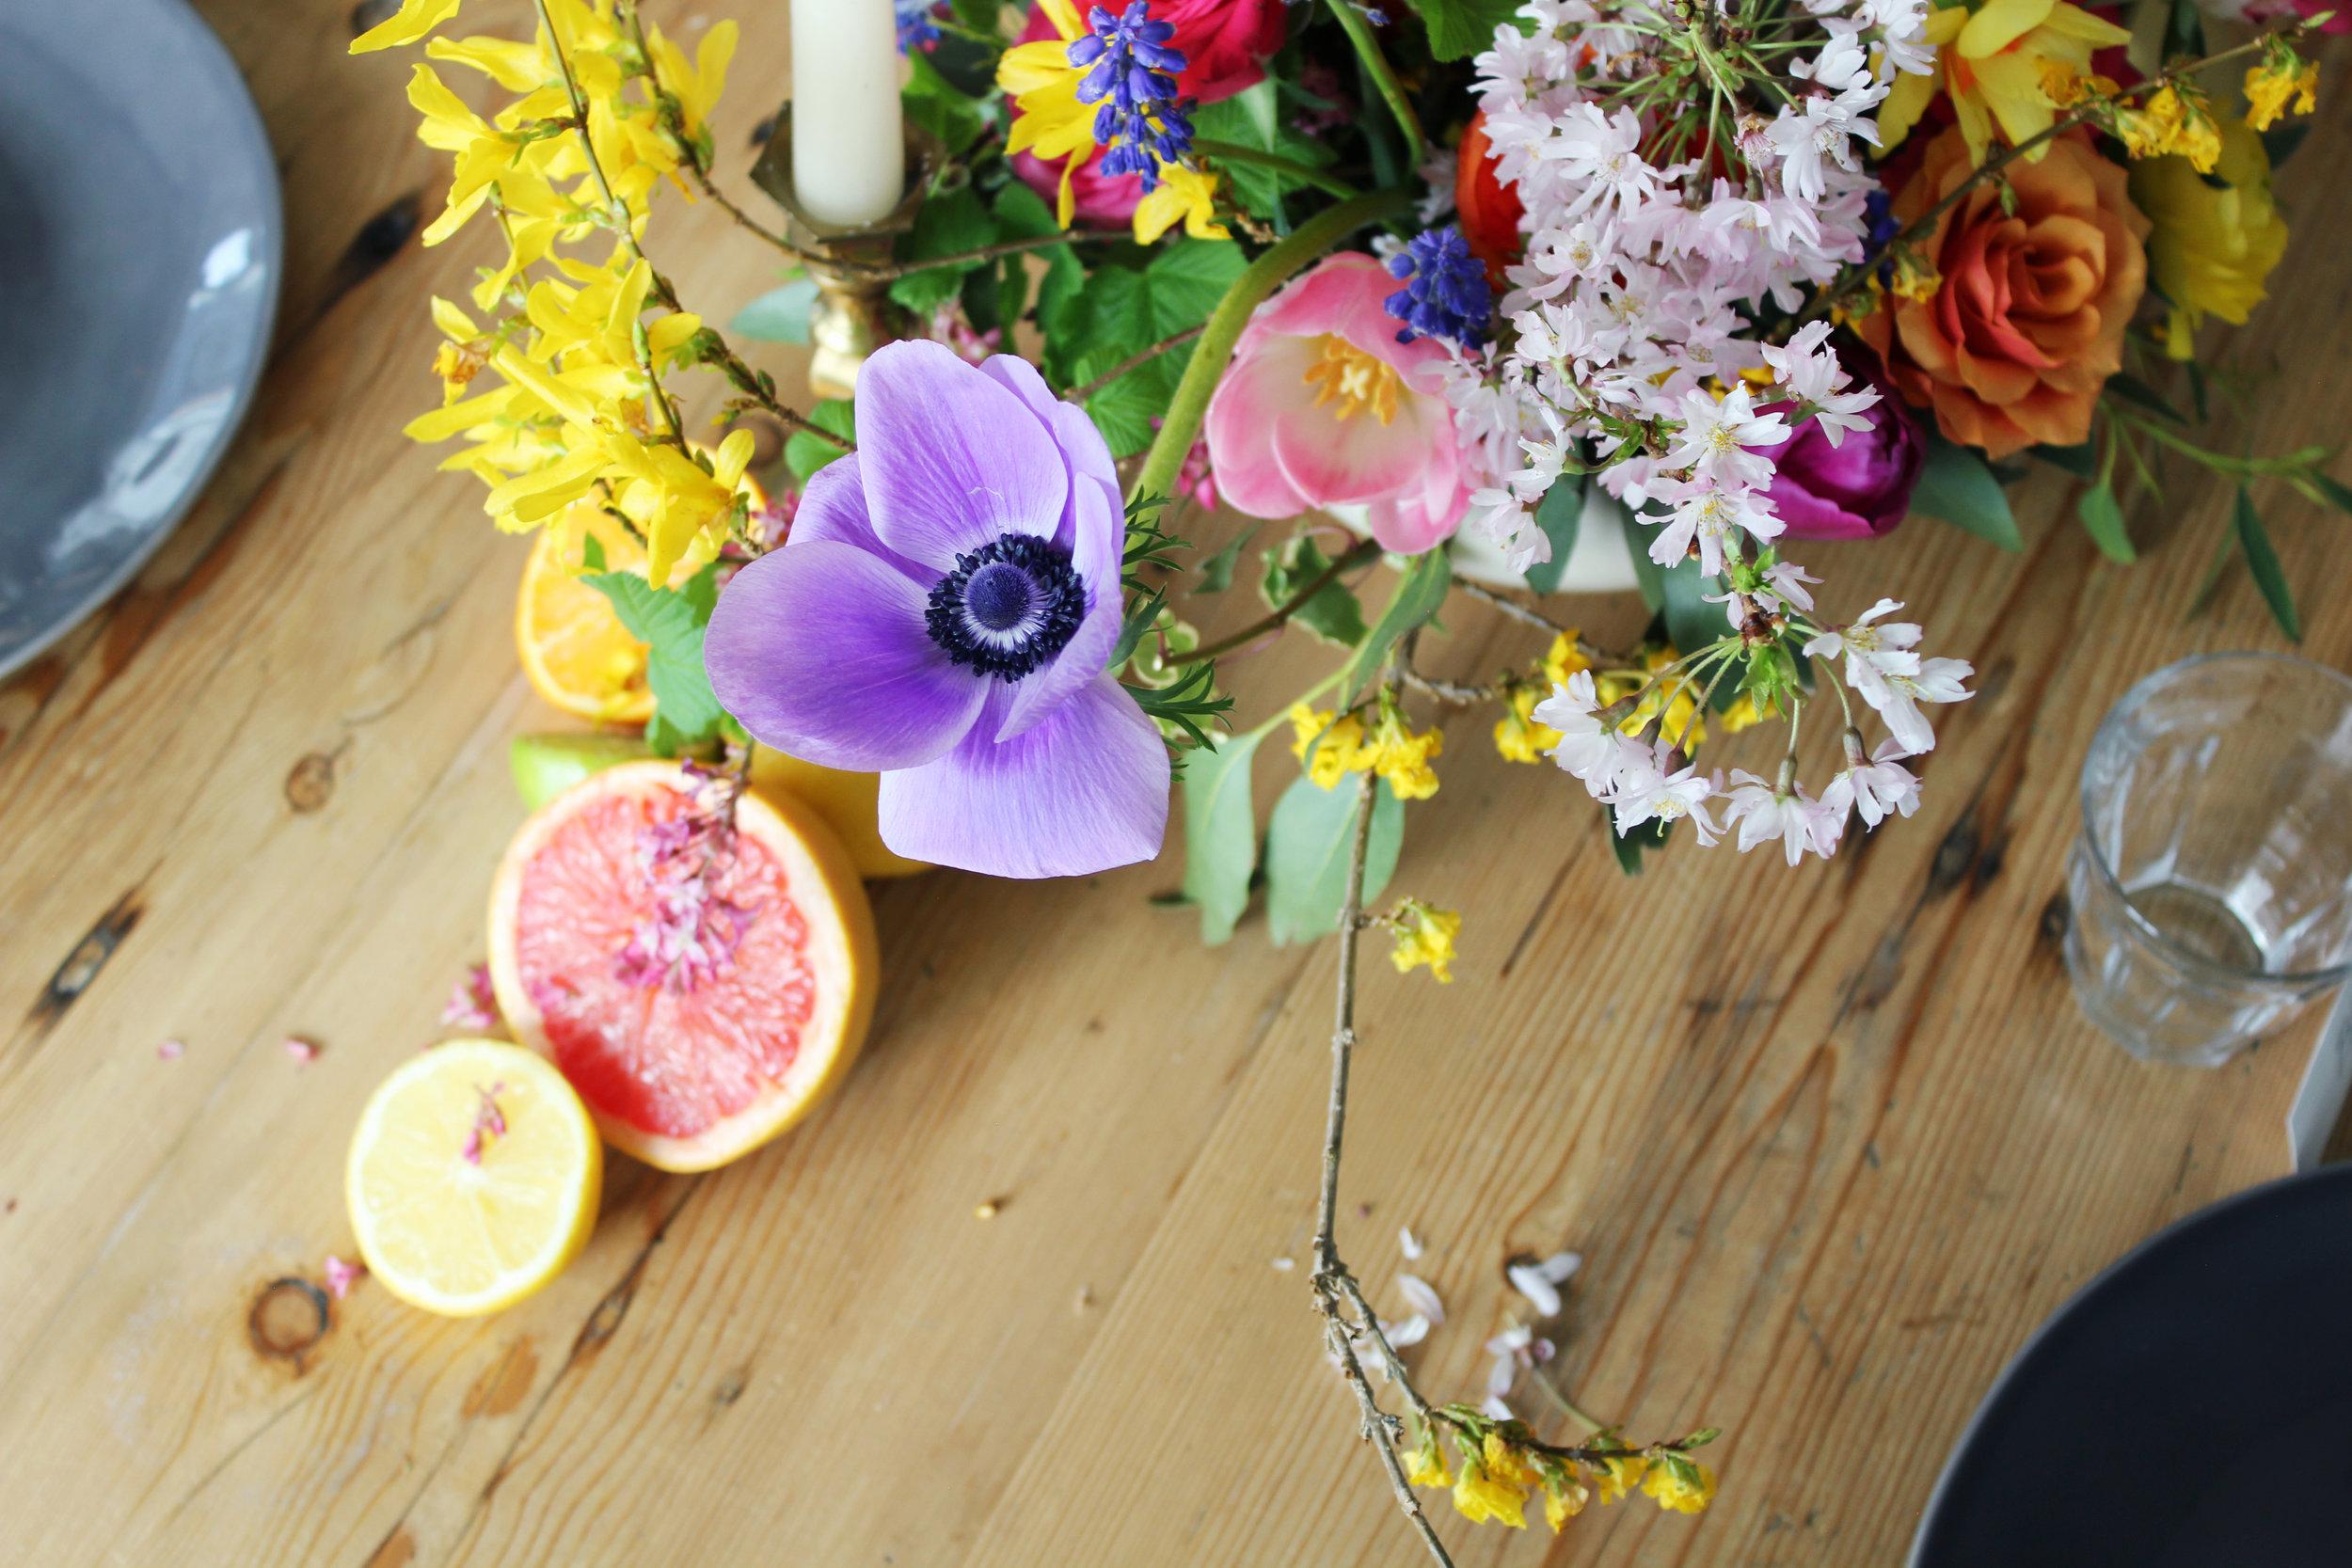 Callie-Pettigrew-Fruity-Florals-8.jpg